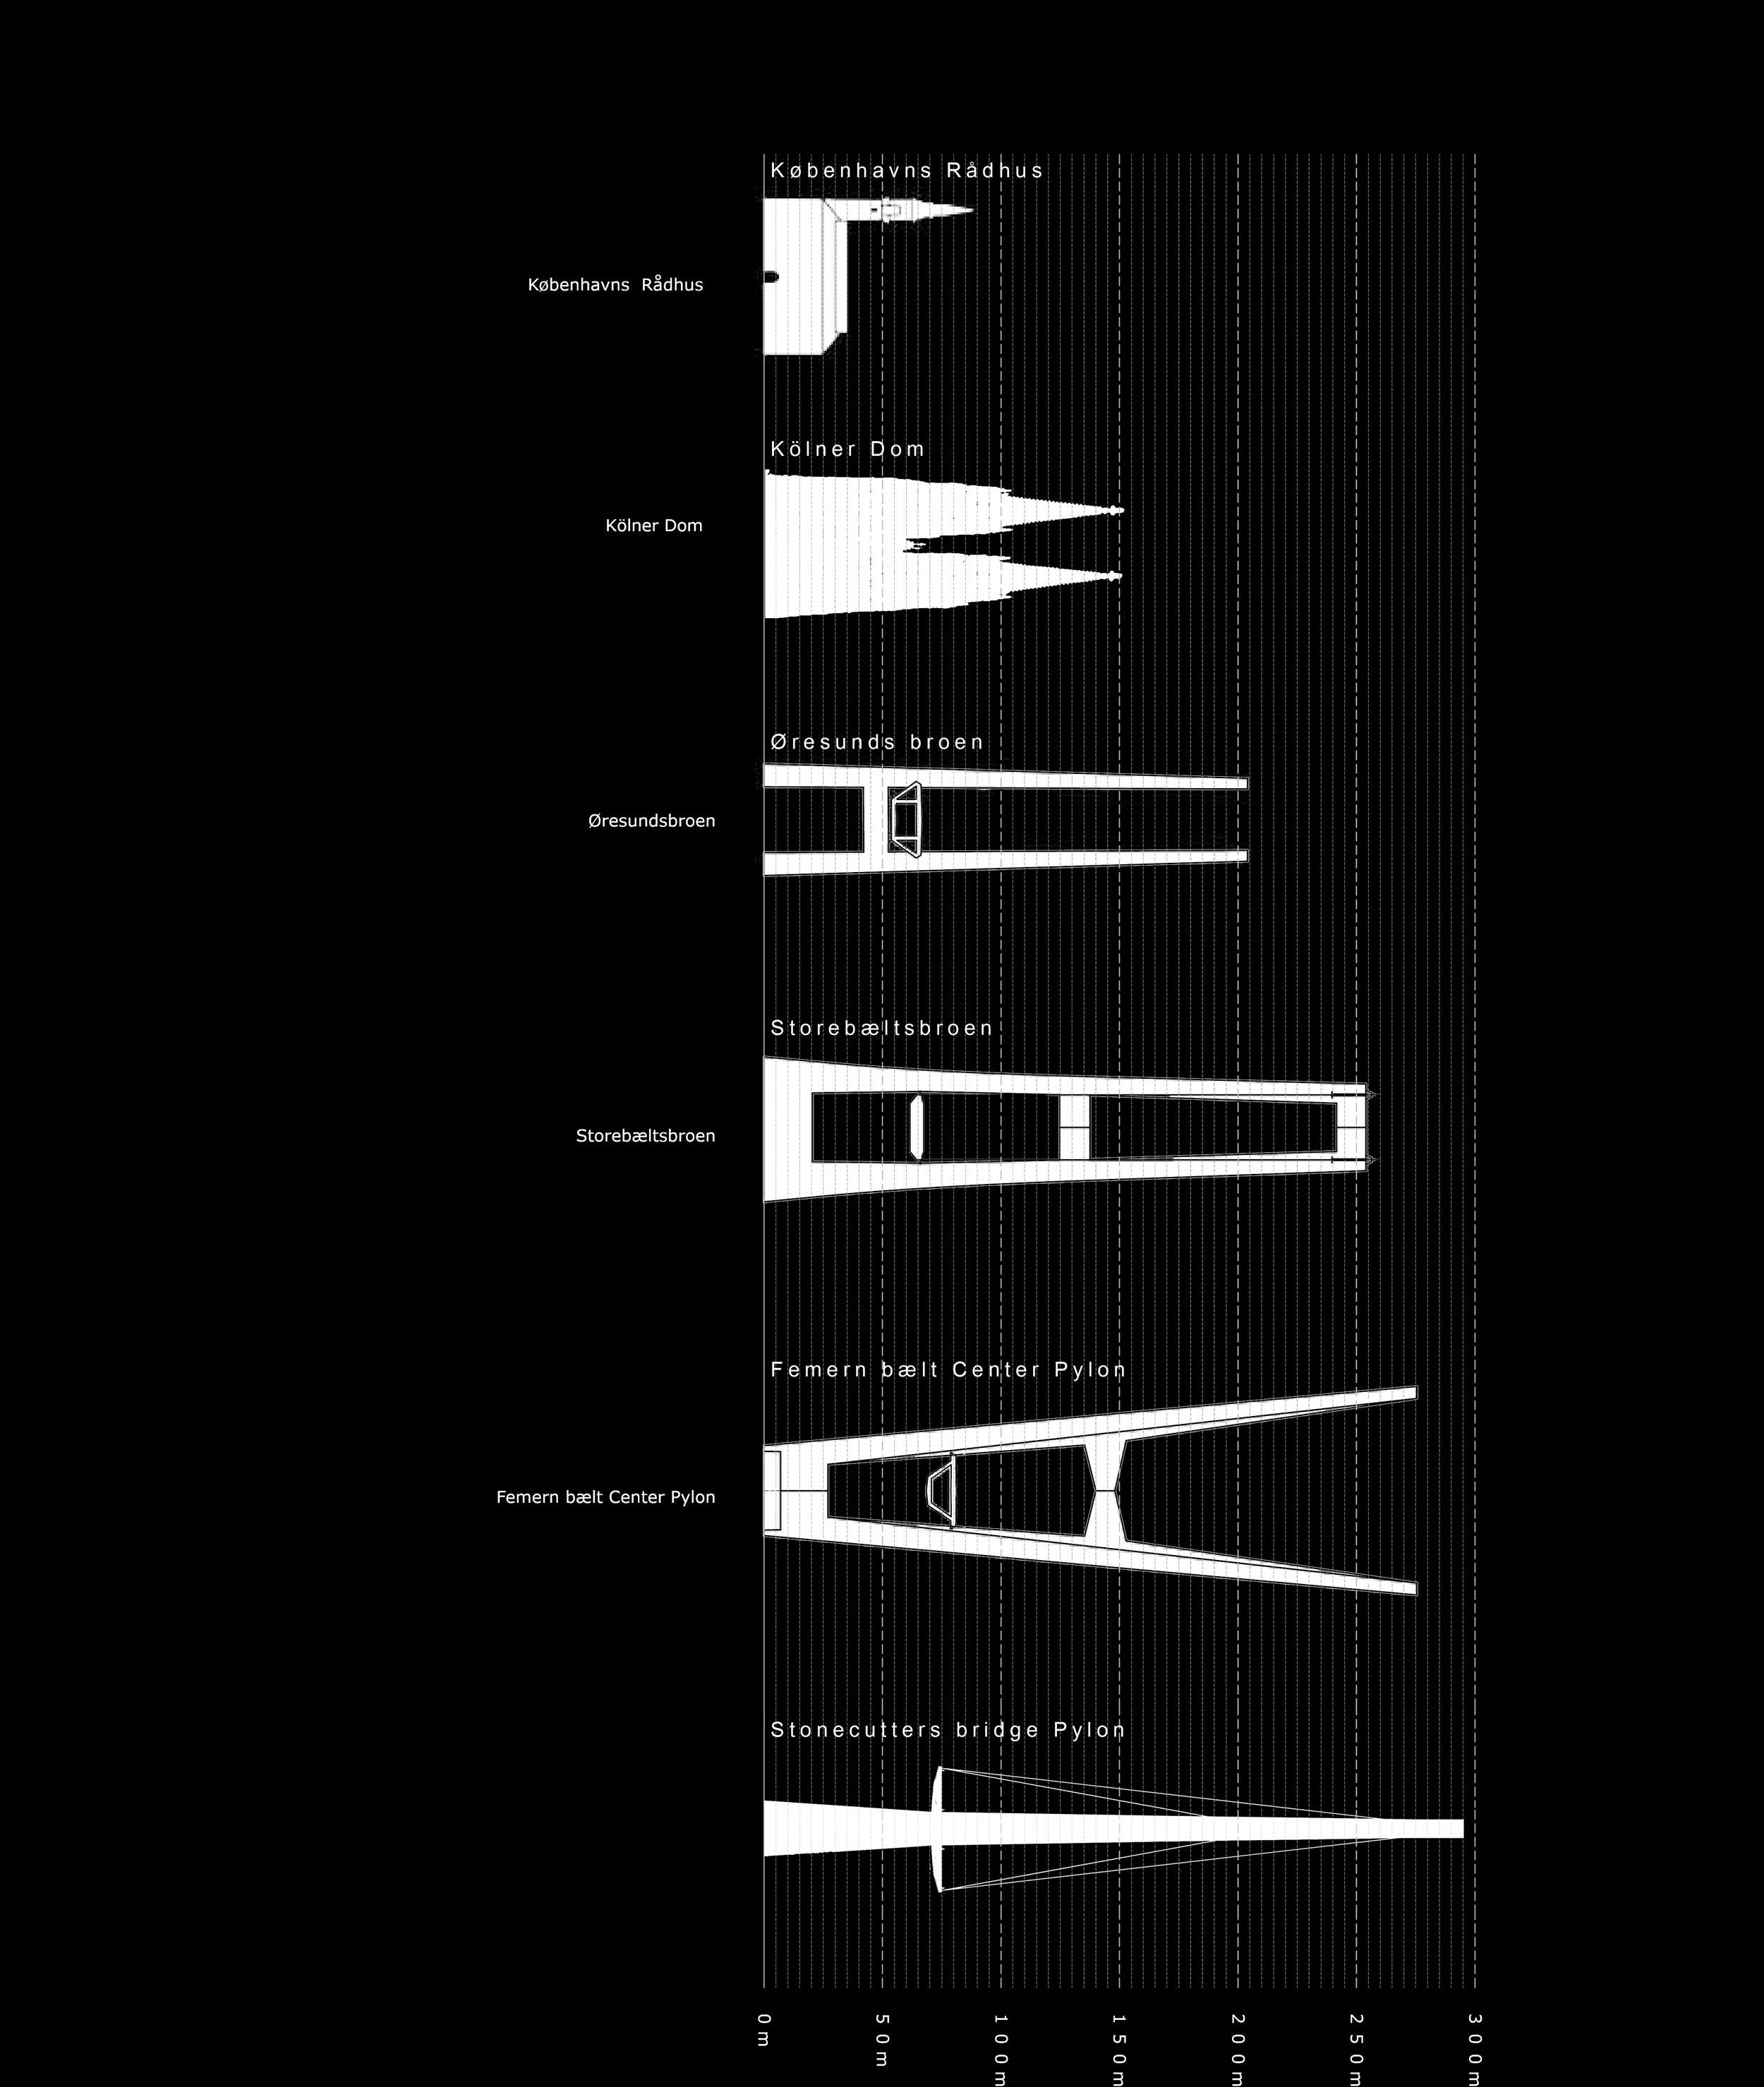 _20100630-femern---pylon-højde-diagram.jpg